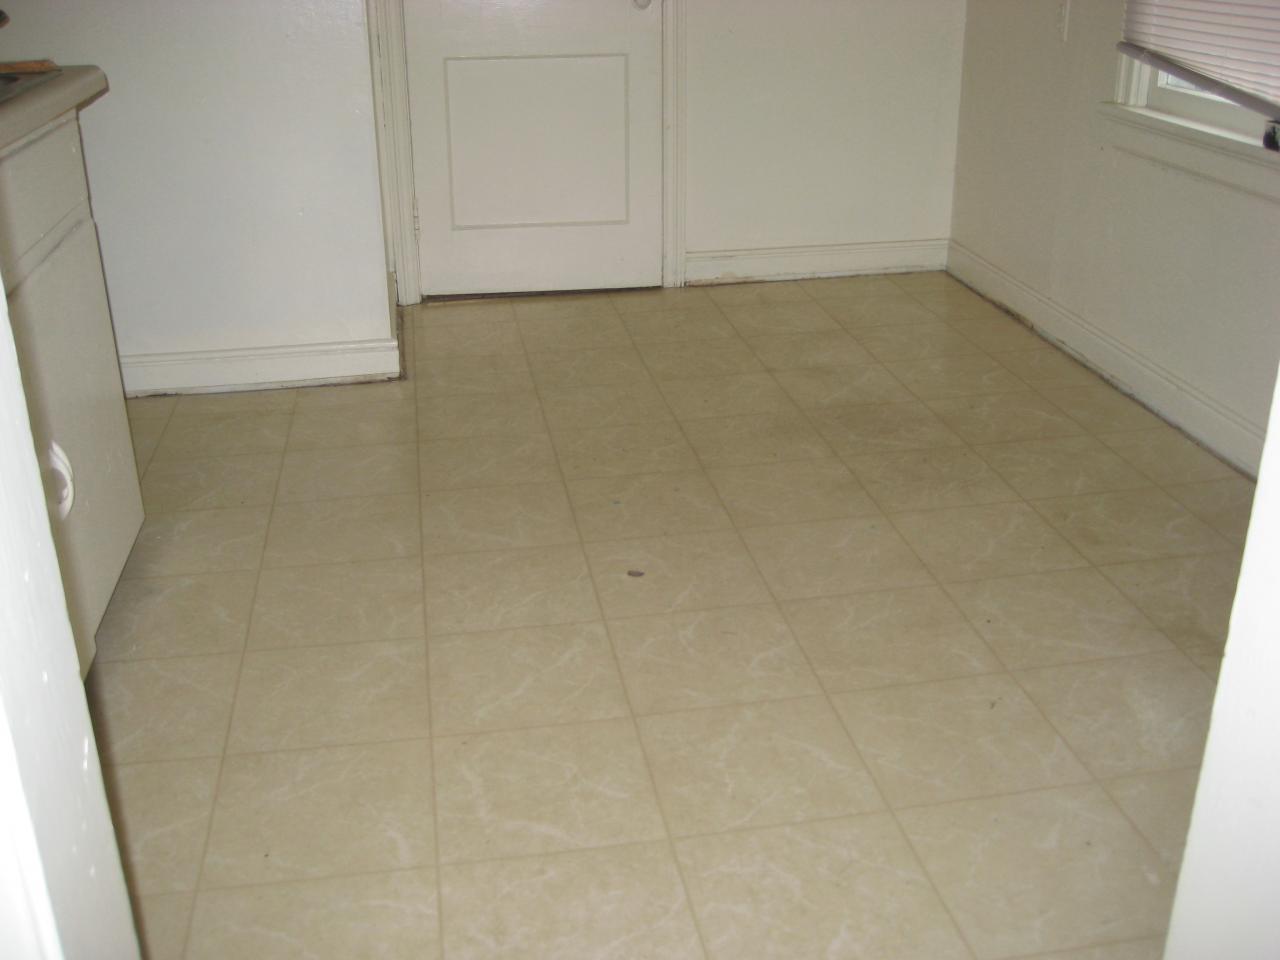 39 holiday 39 textures and surfaces on pinterest linoleum for Dark wood linoleum flooring